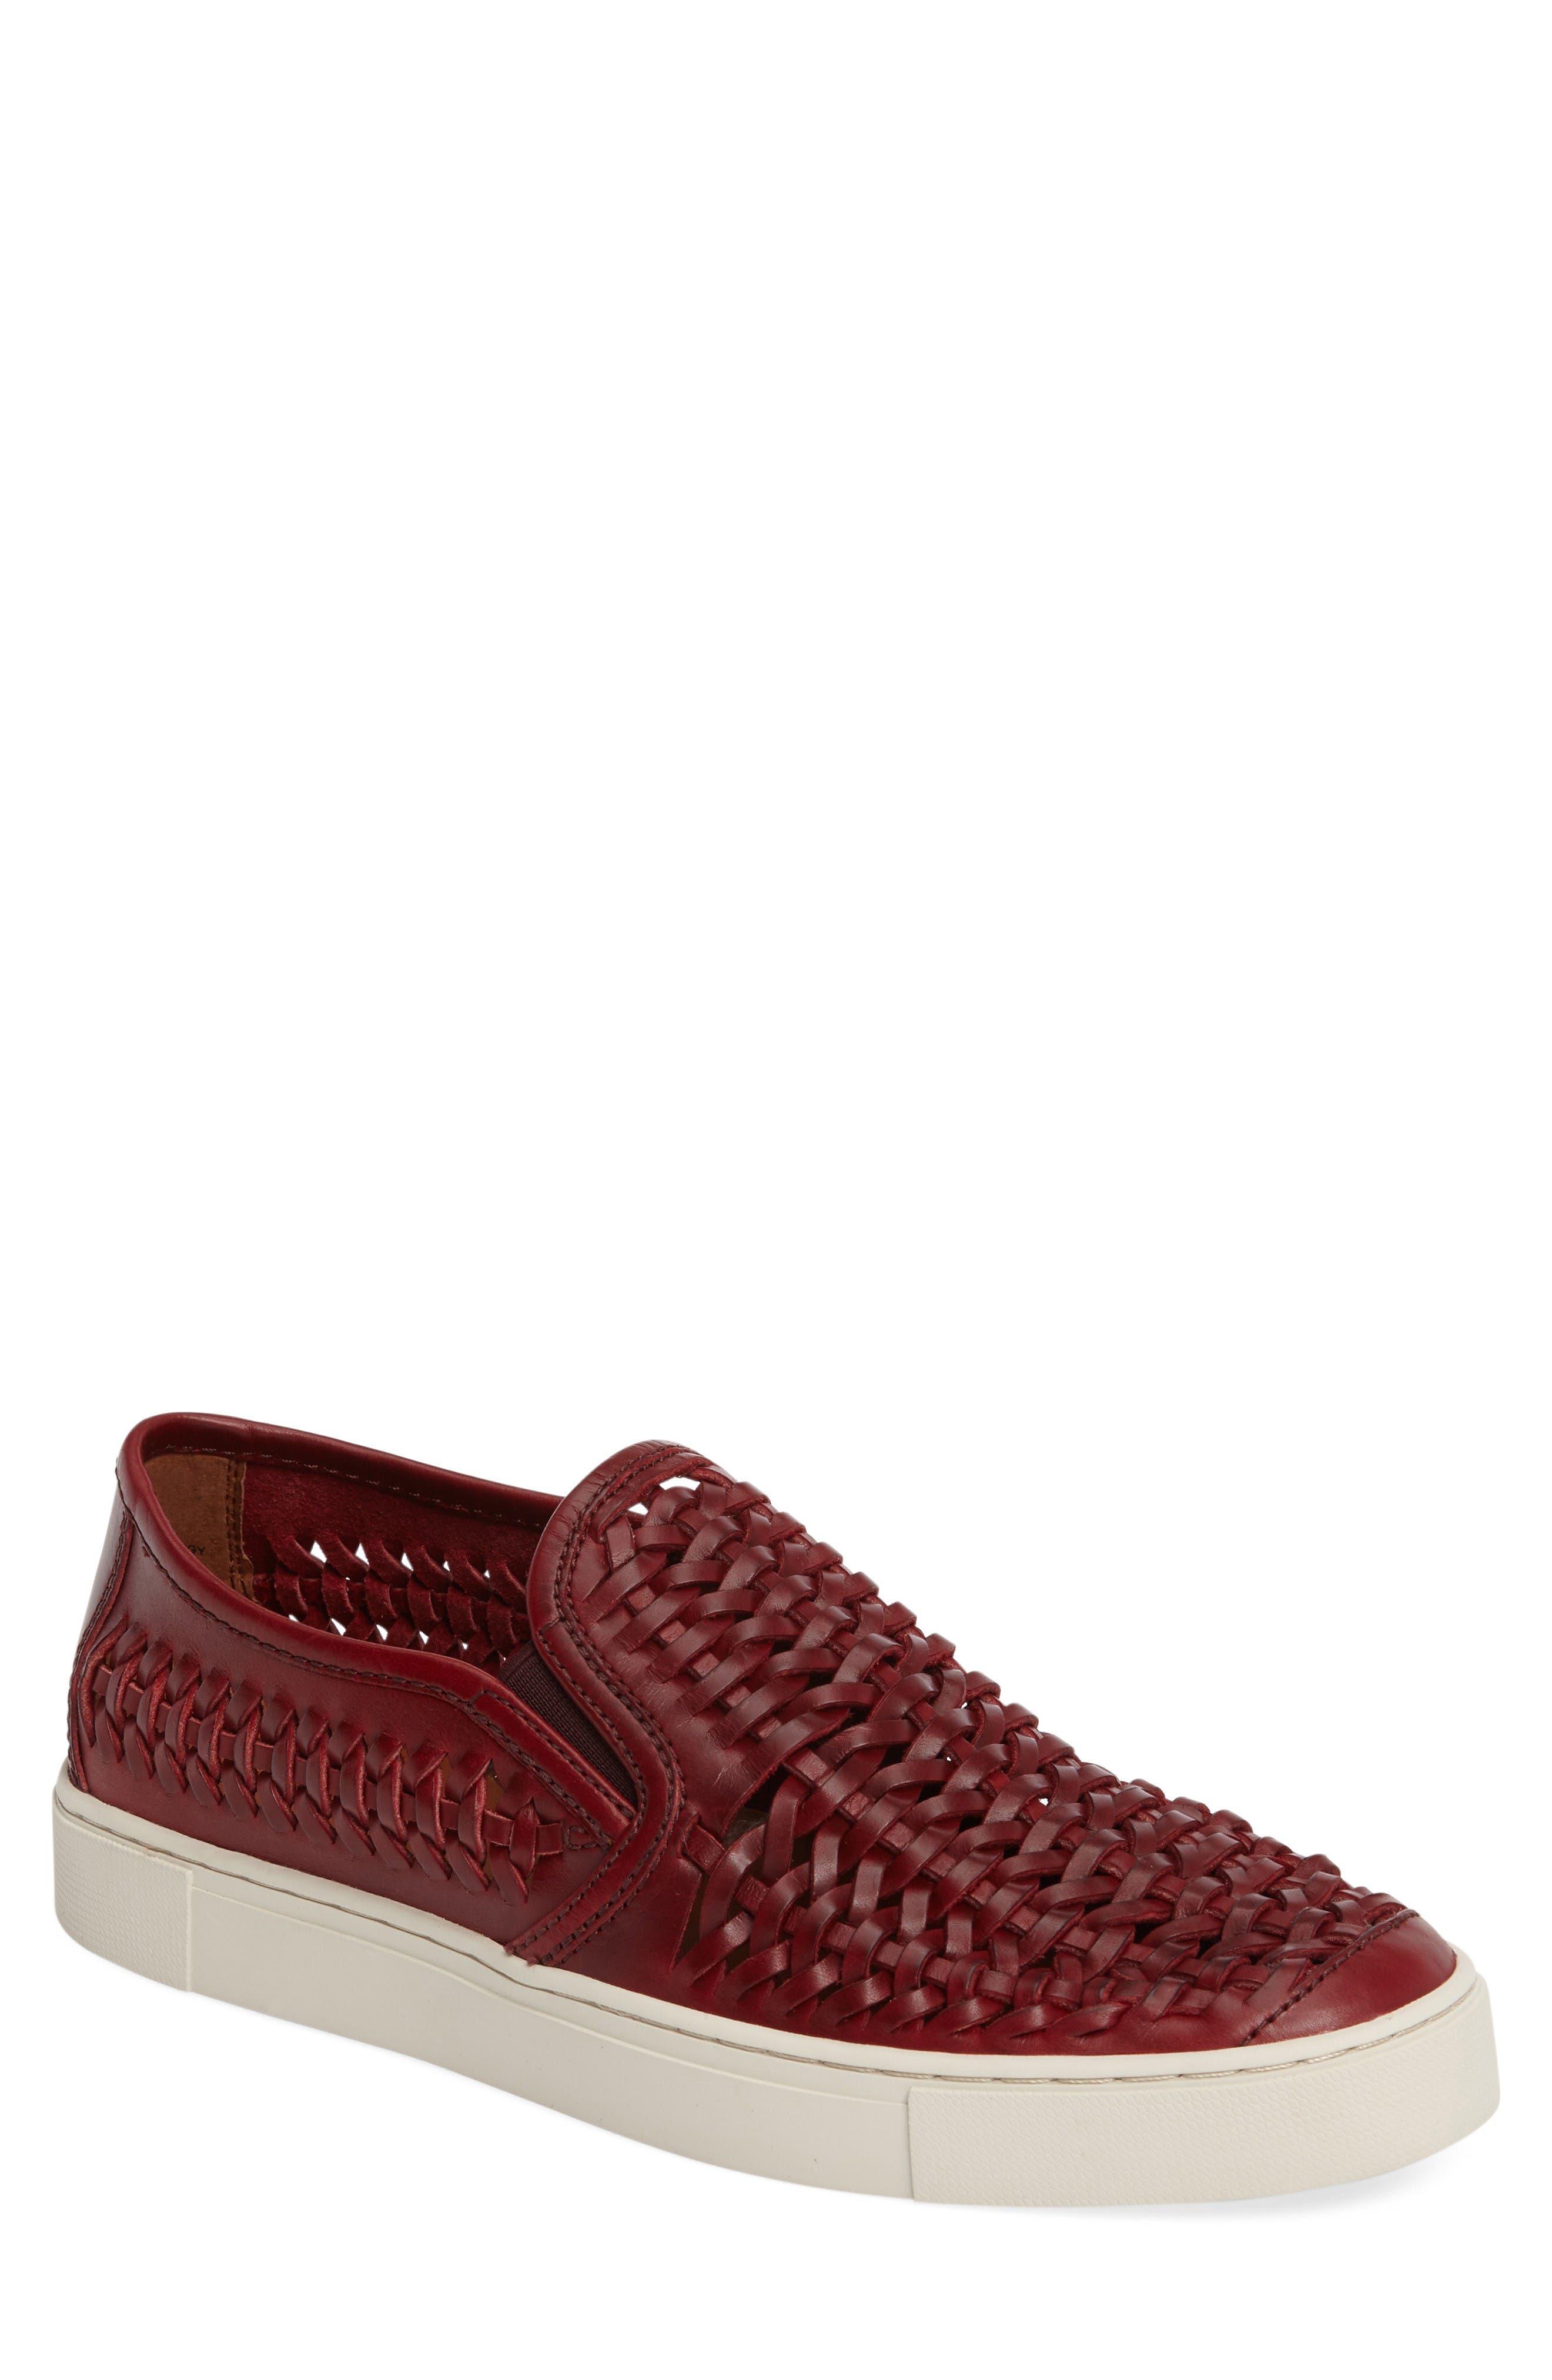 Gabe Slip-On,                         Main,                         color, Burgundy Leather